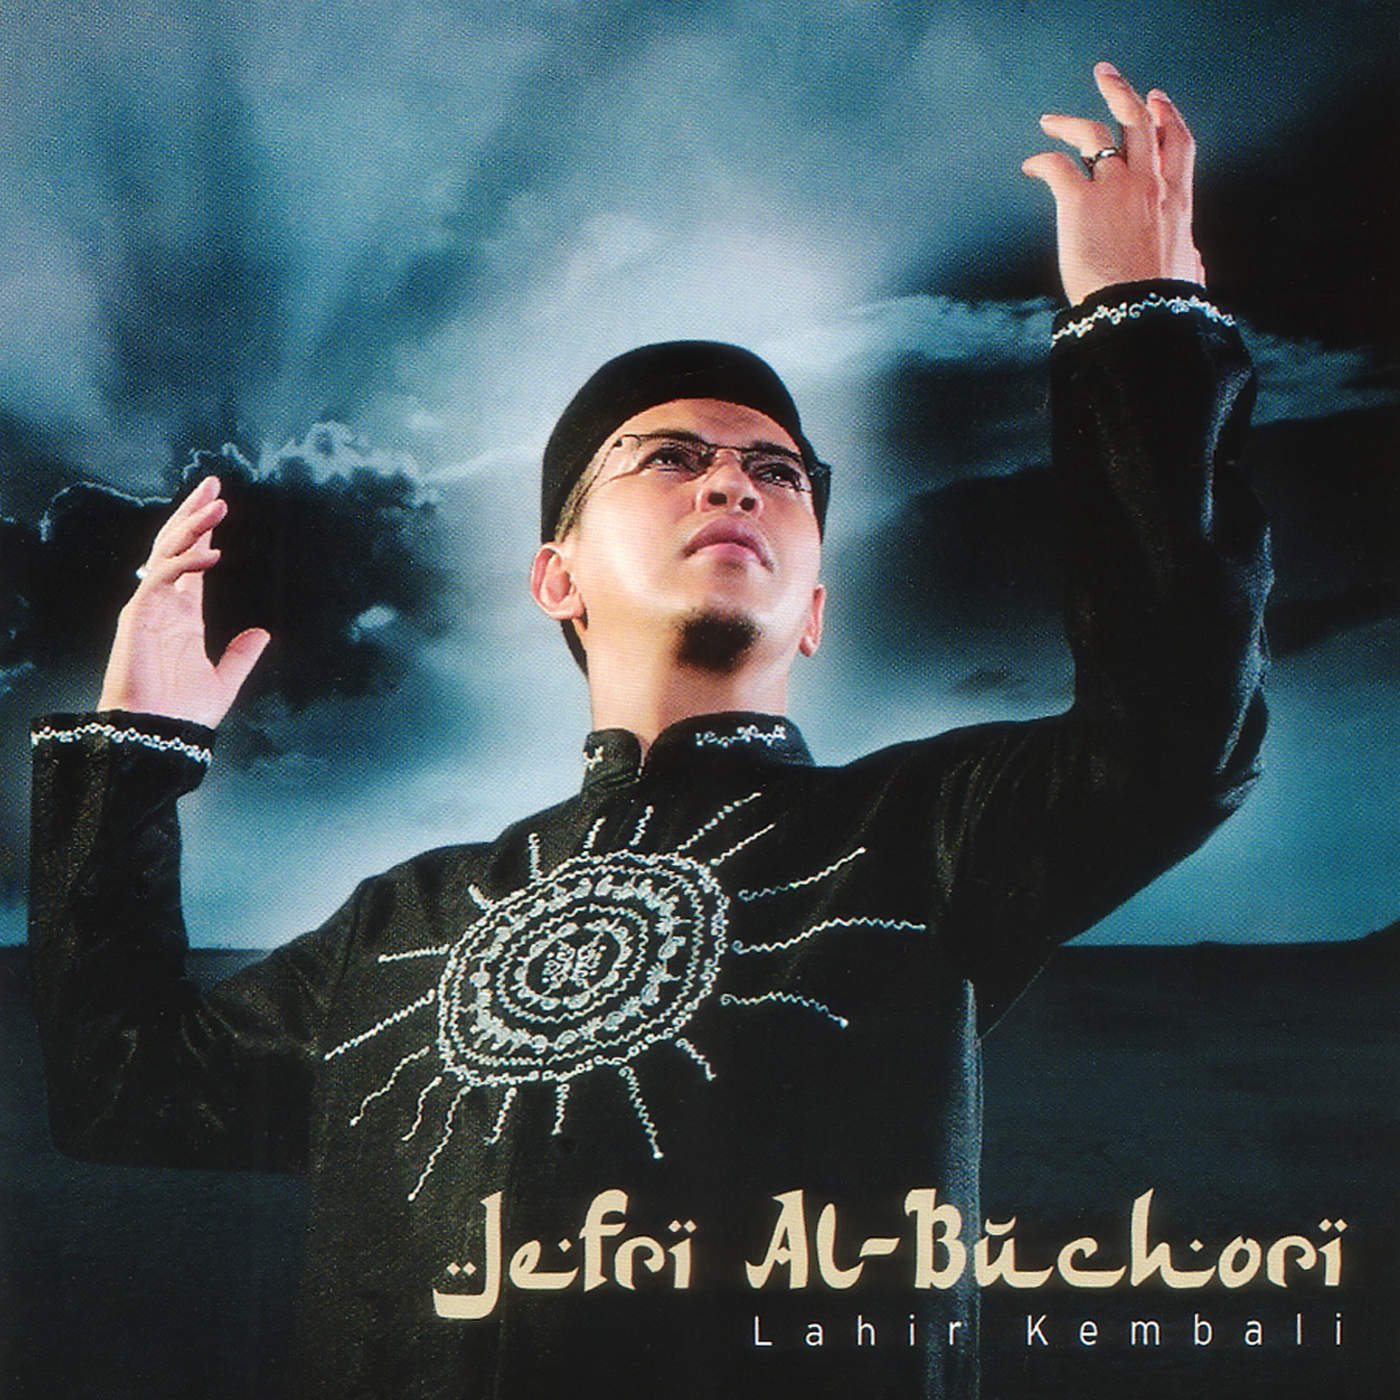 Ustadz Jefri Al Buchori - Lahir Kembali - Album (2005) [iTunes Plus AAC M4A]